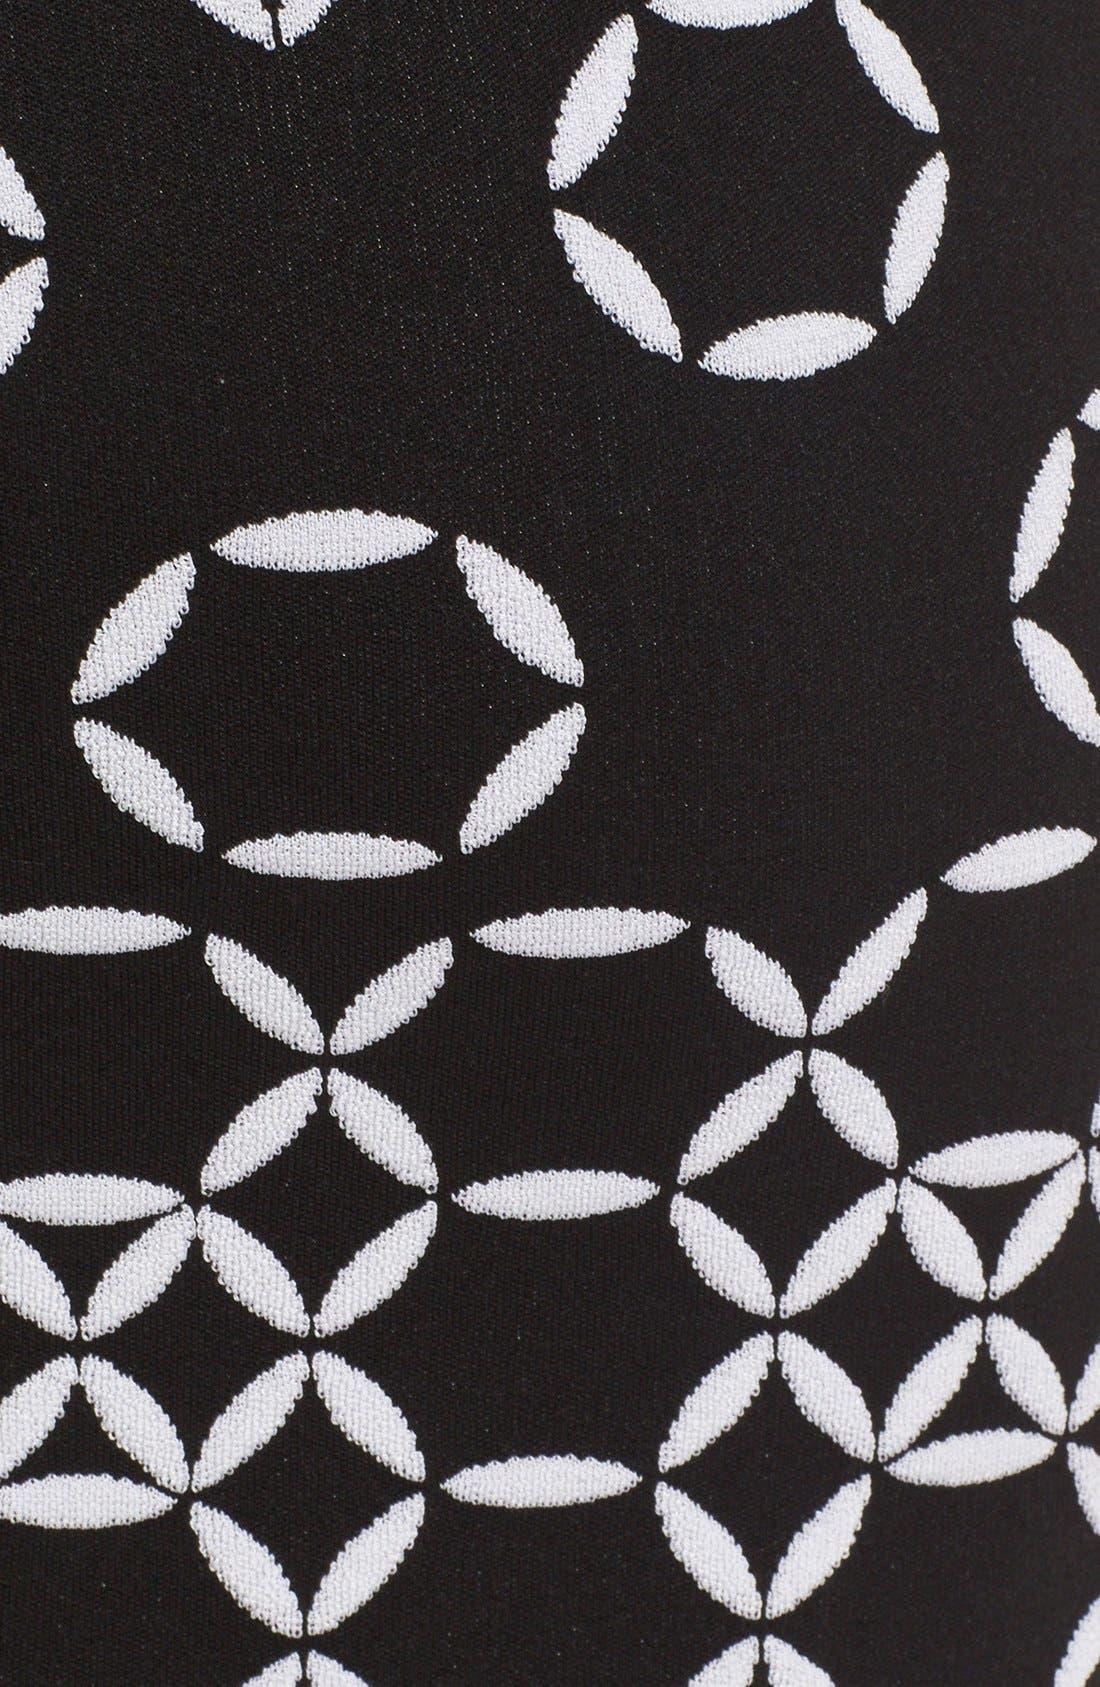 Graphic Knit Sheath Dress,                             Alternate thumbnail 4, color,                             001